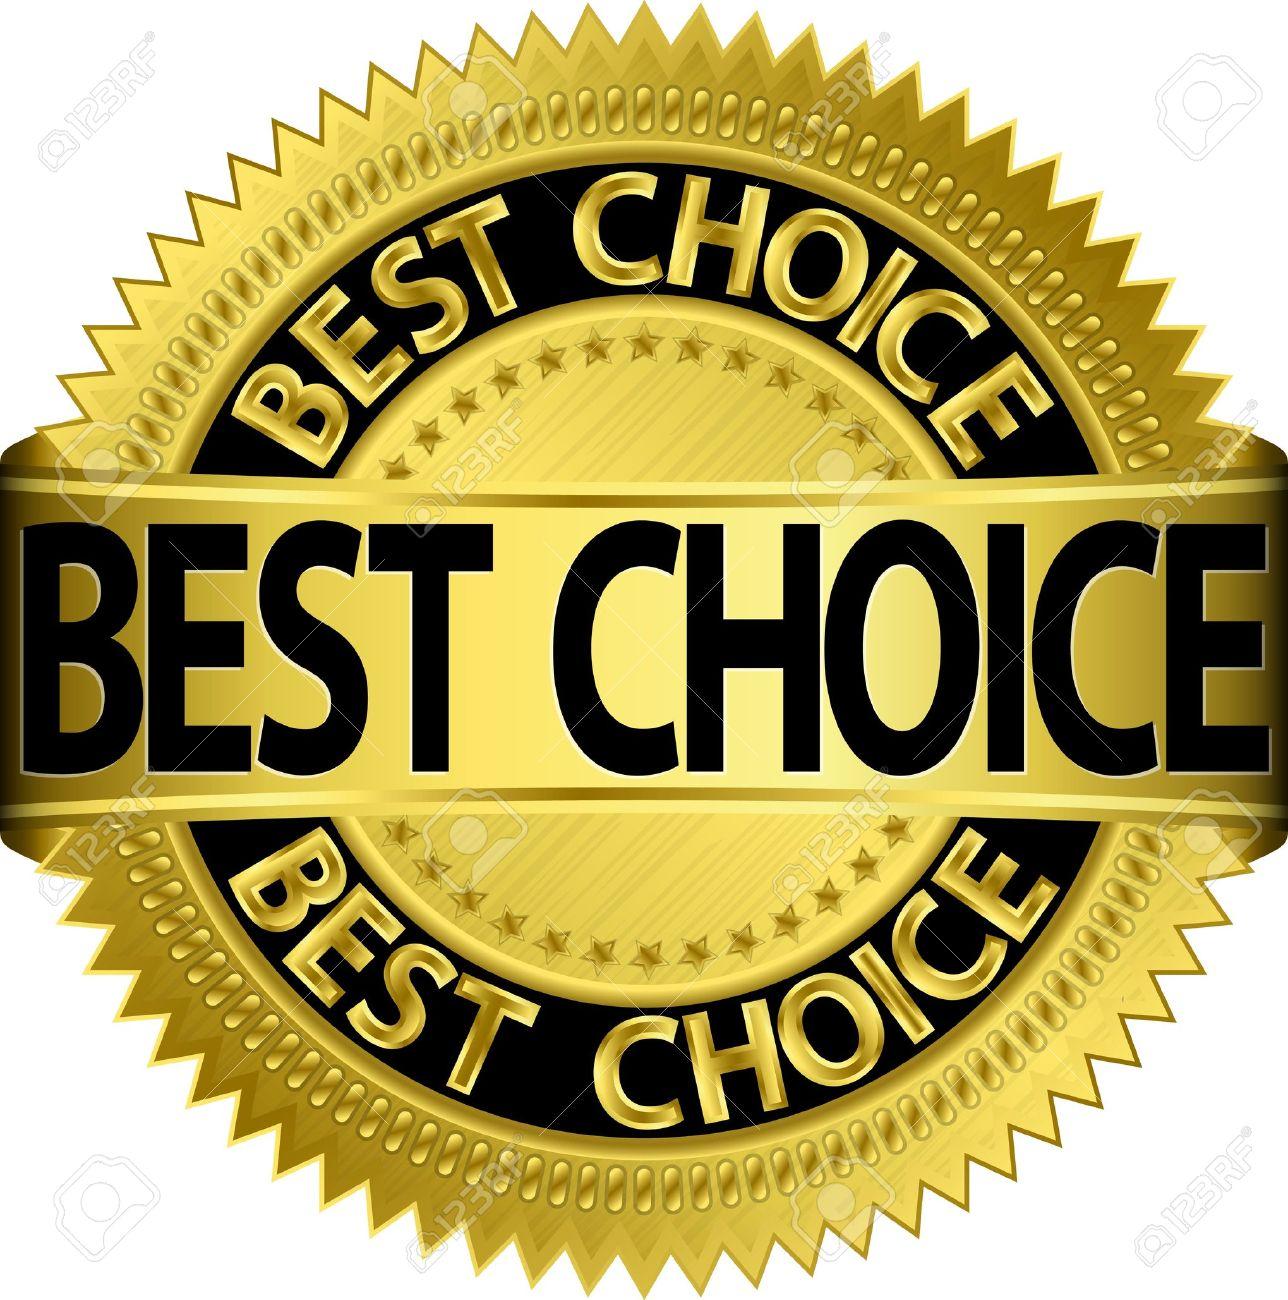 Best choice golden label, illustration - 15922814